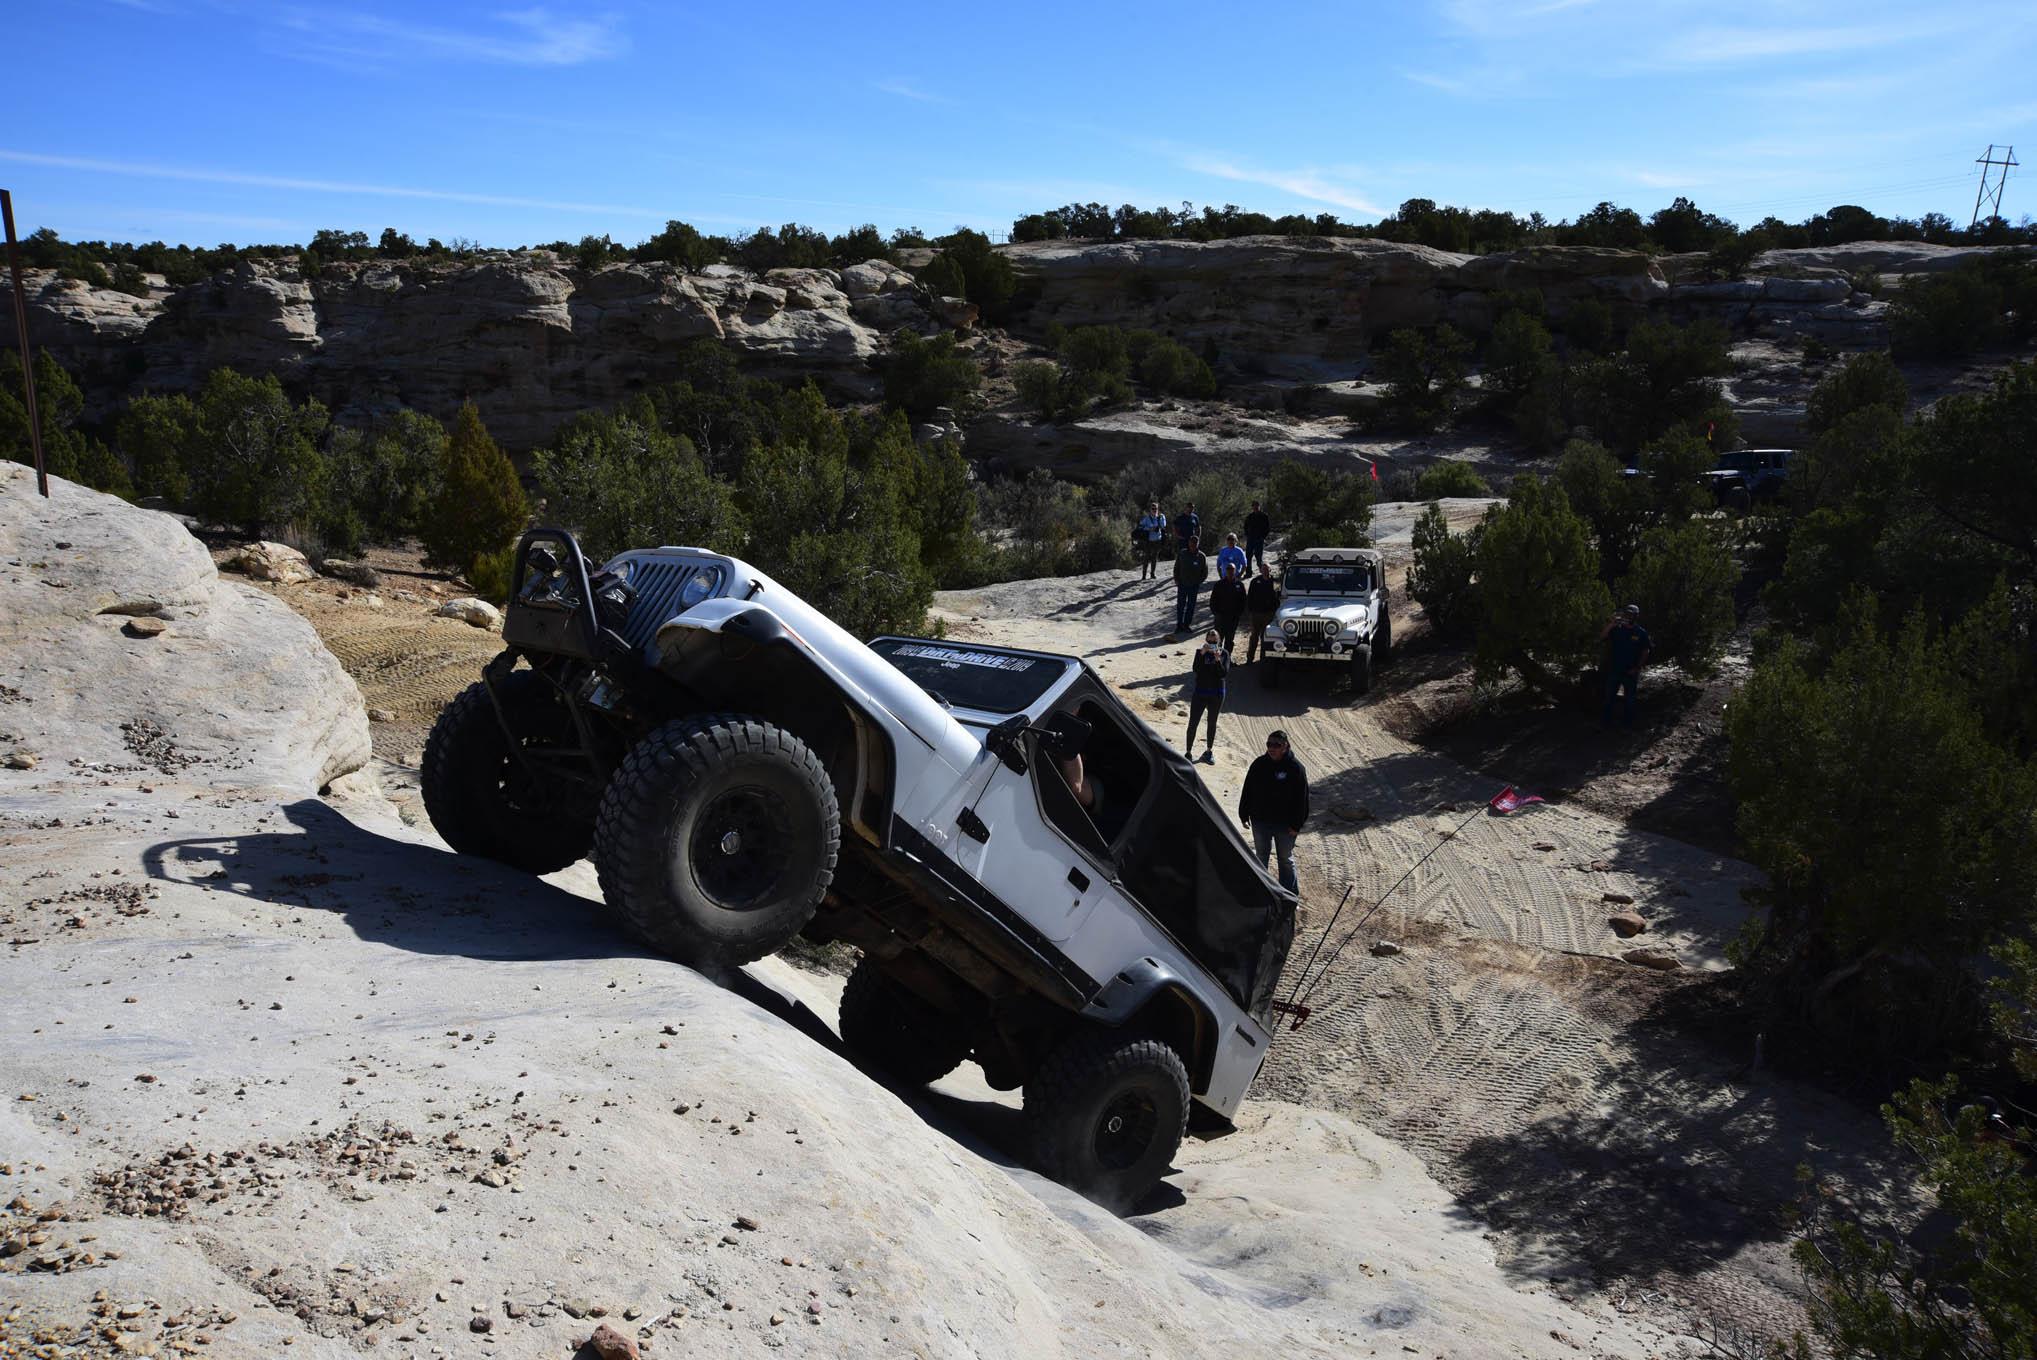 025 jeep 1984 scrambler cj8 cj 8 jp magazine stuart bourdon aaron paris